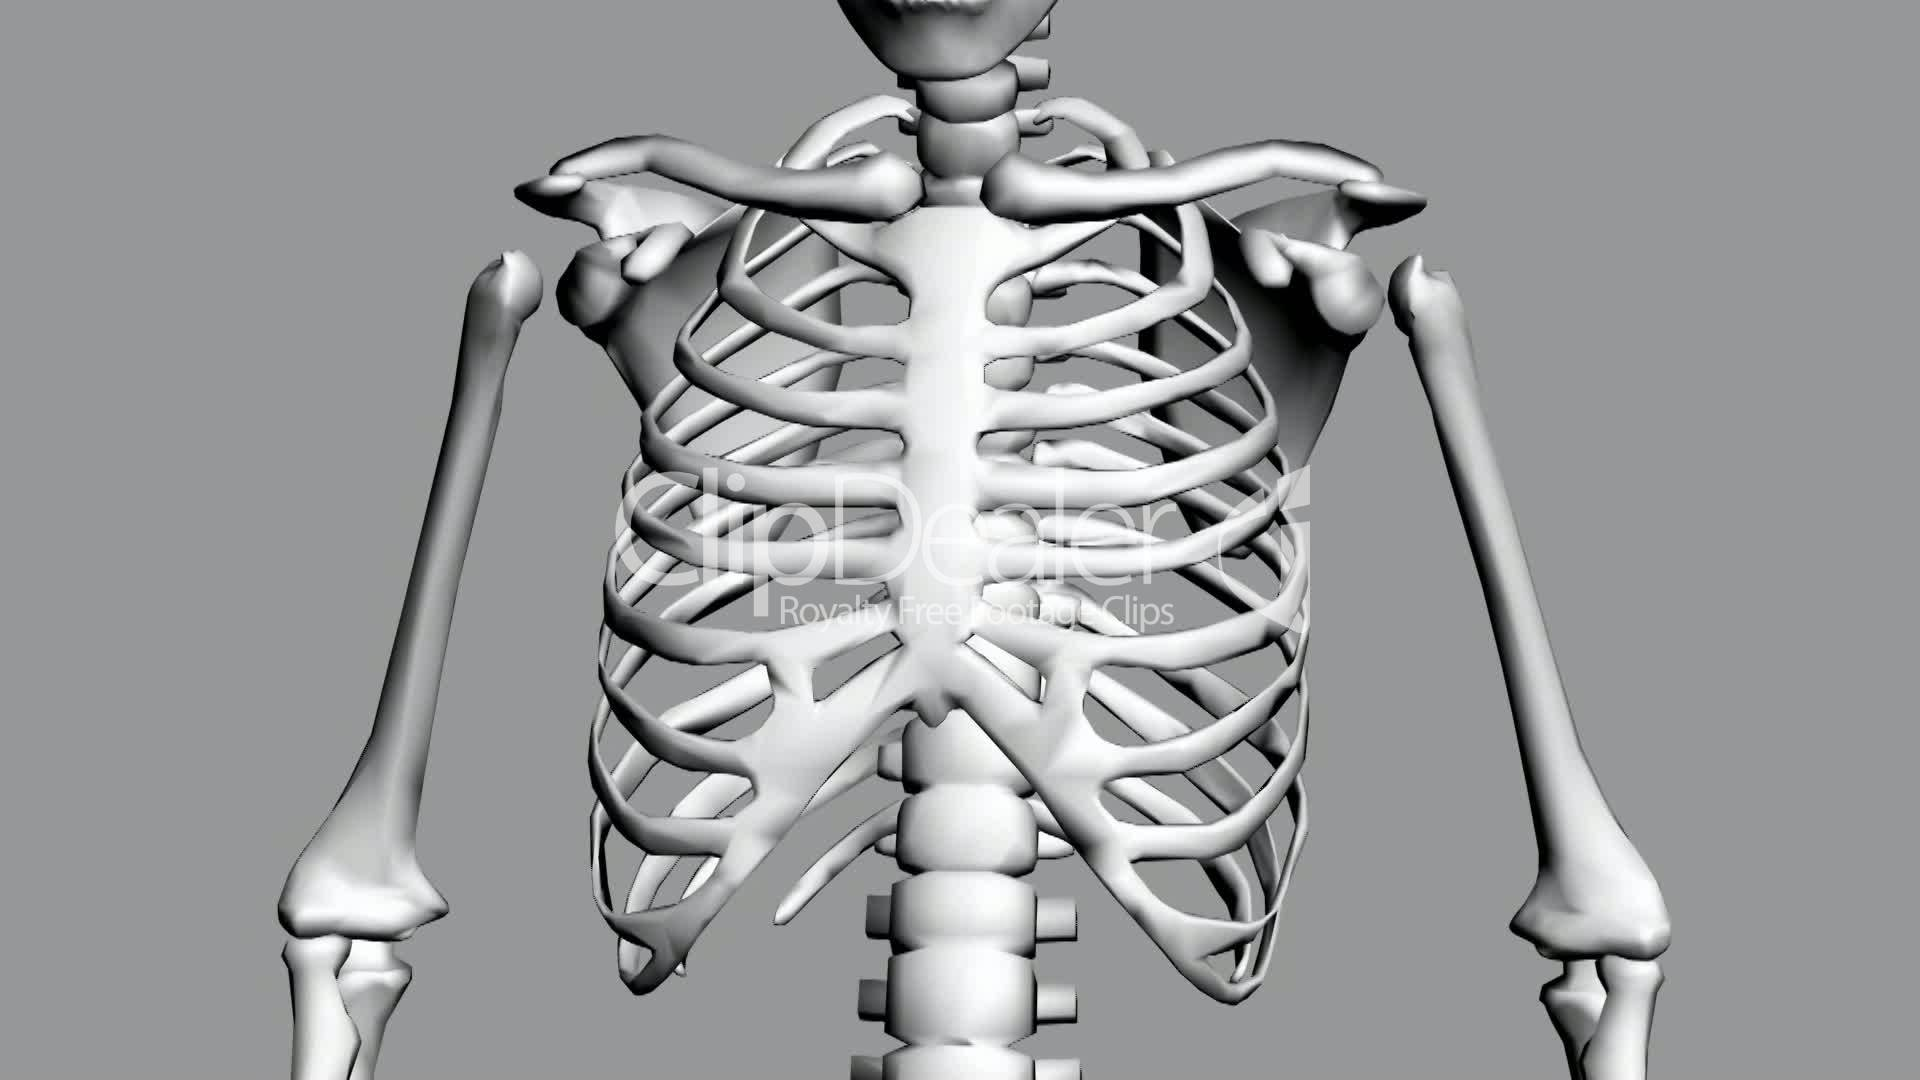 Rotation Of 3d Skeletonribschestanatomyhumanmedicalbodyskull